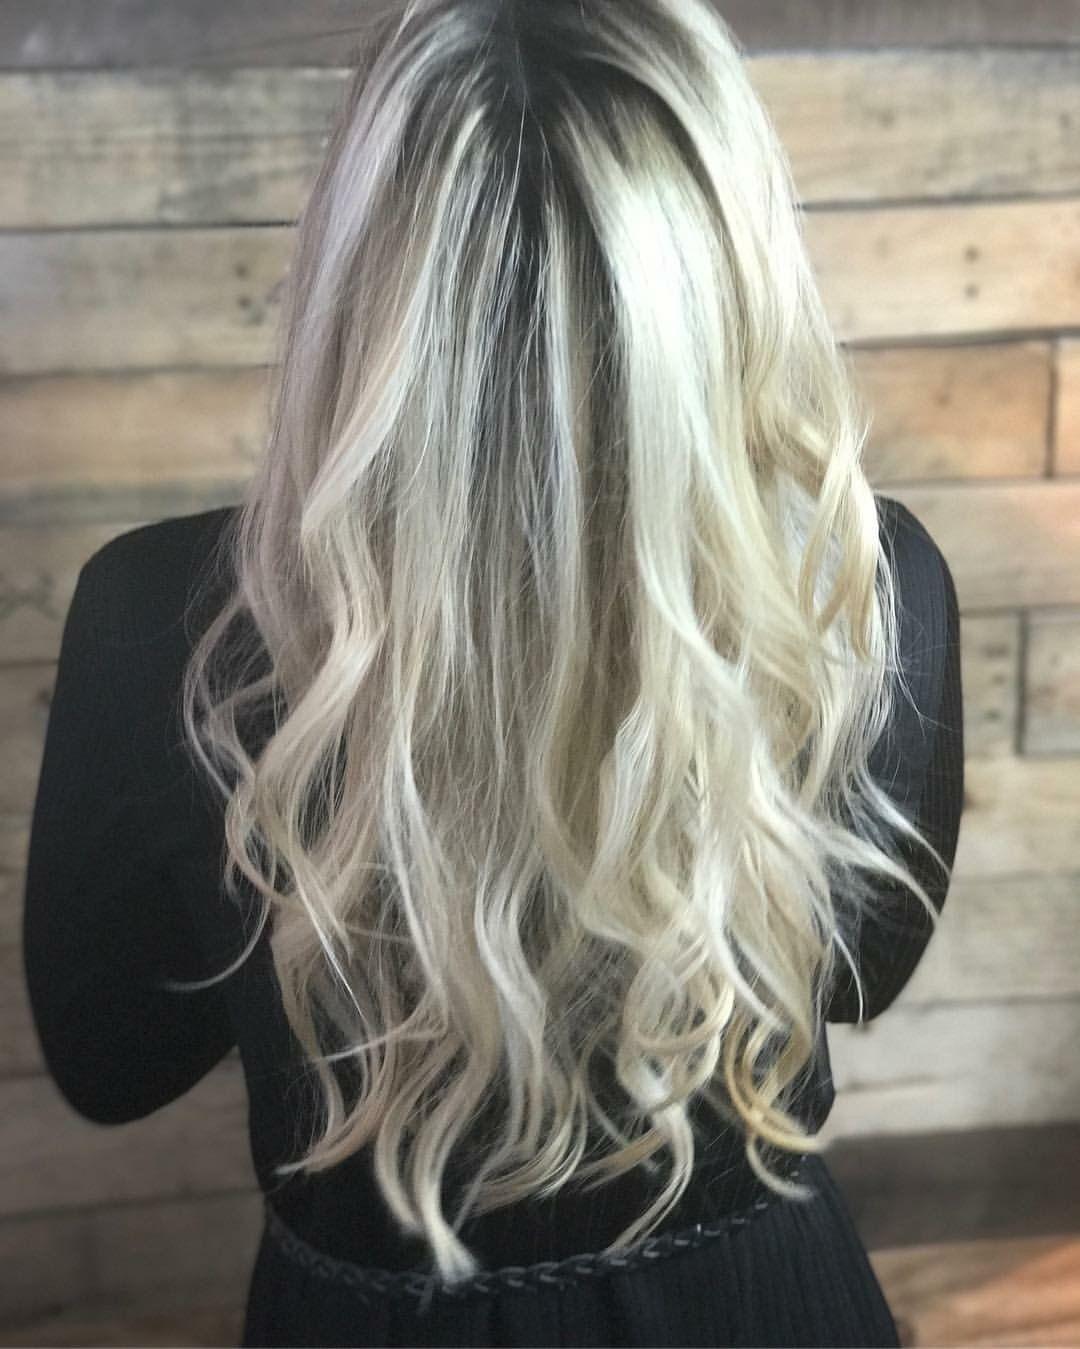 Full Highlight By Coley Long Hair Styles Hair Beauty